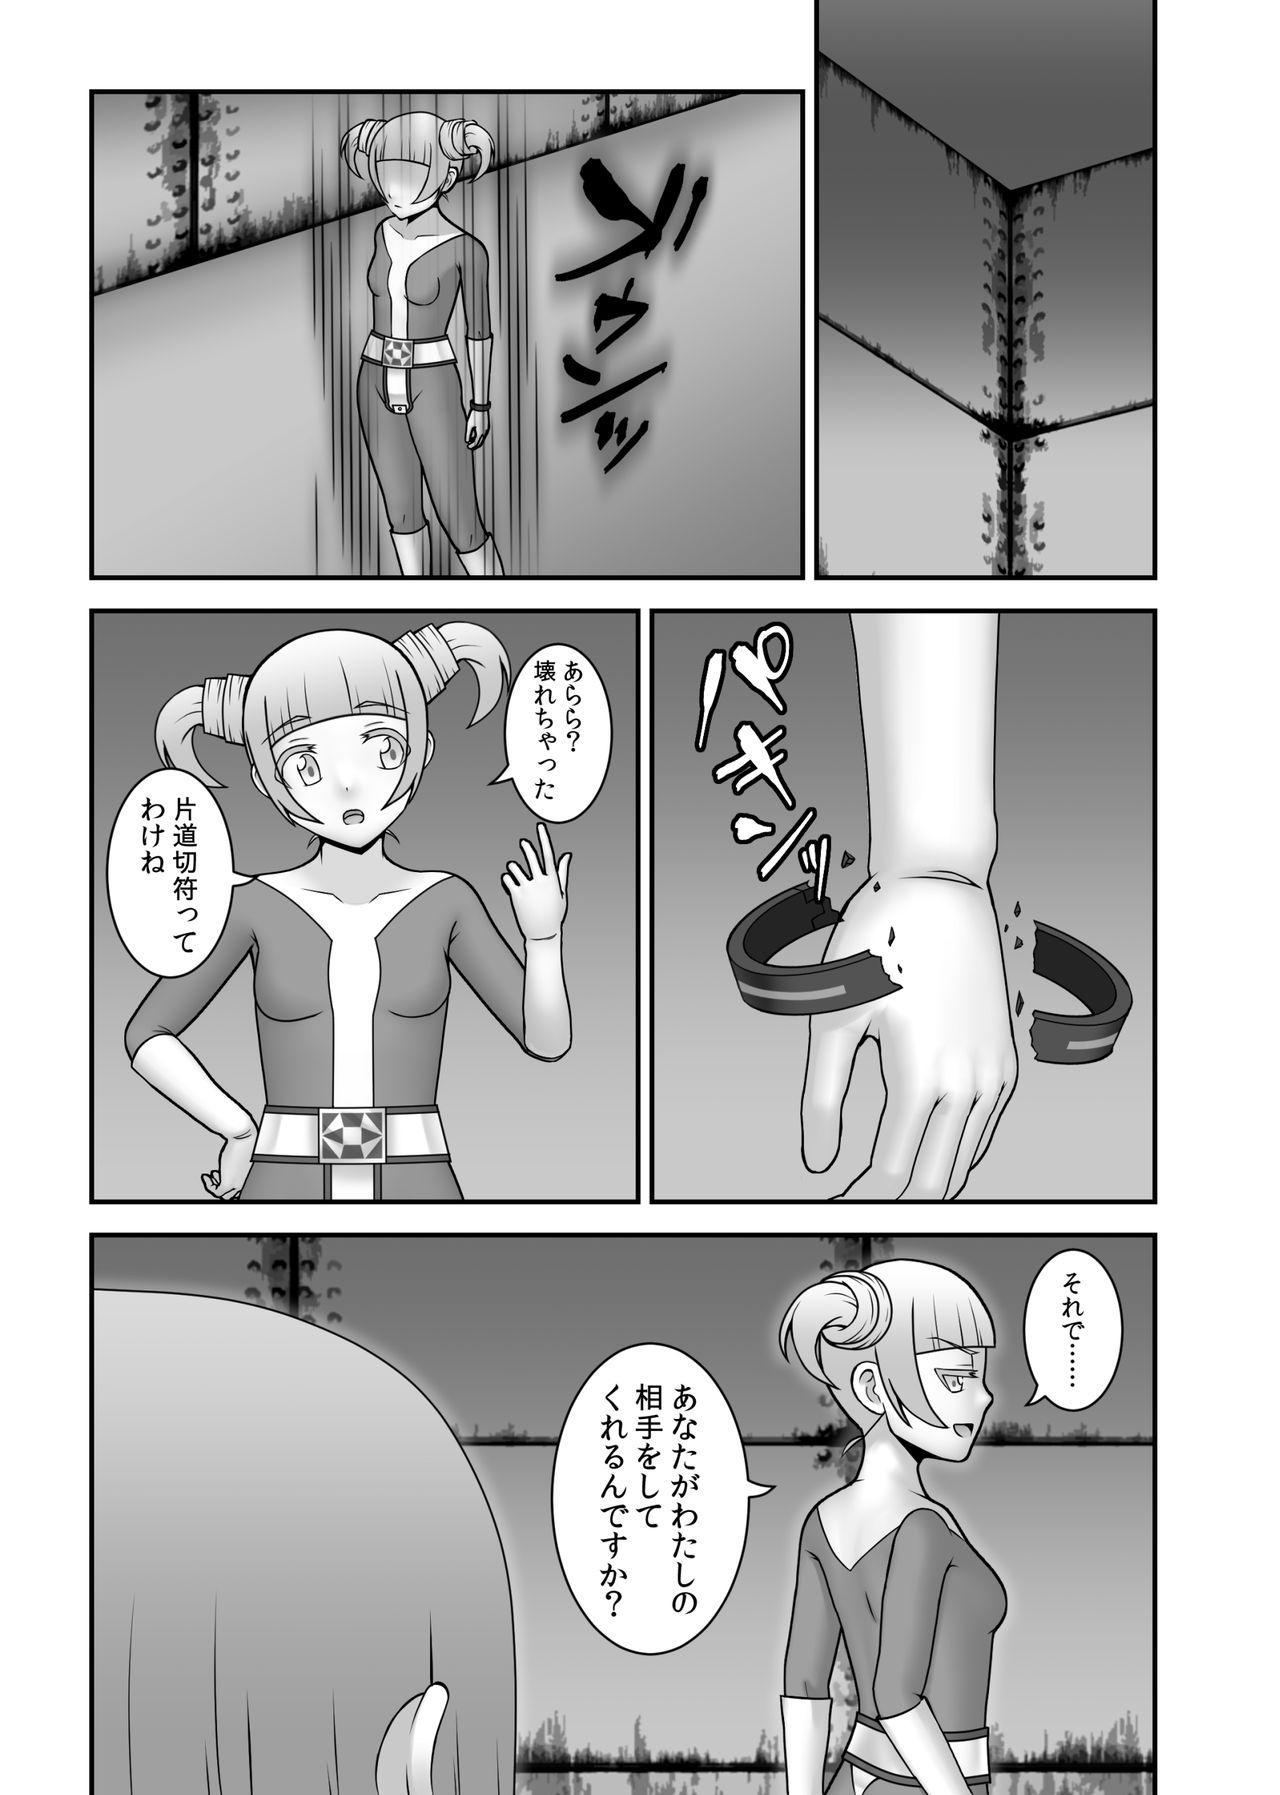 [STUDIO HP+ (IceLee)] Teisou Sentai Virginal Colors Dai-Go-wa 7